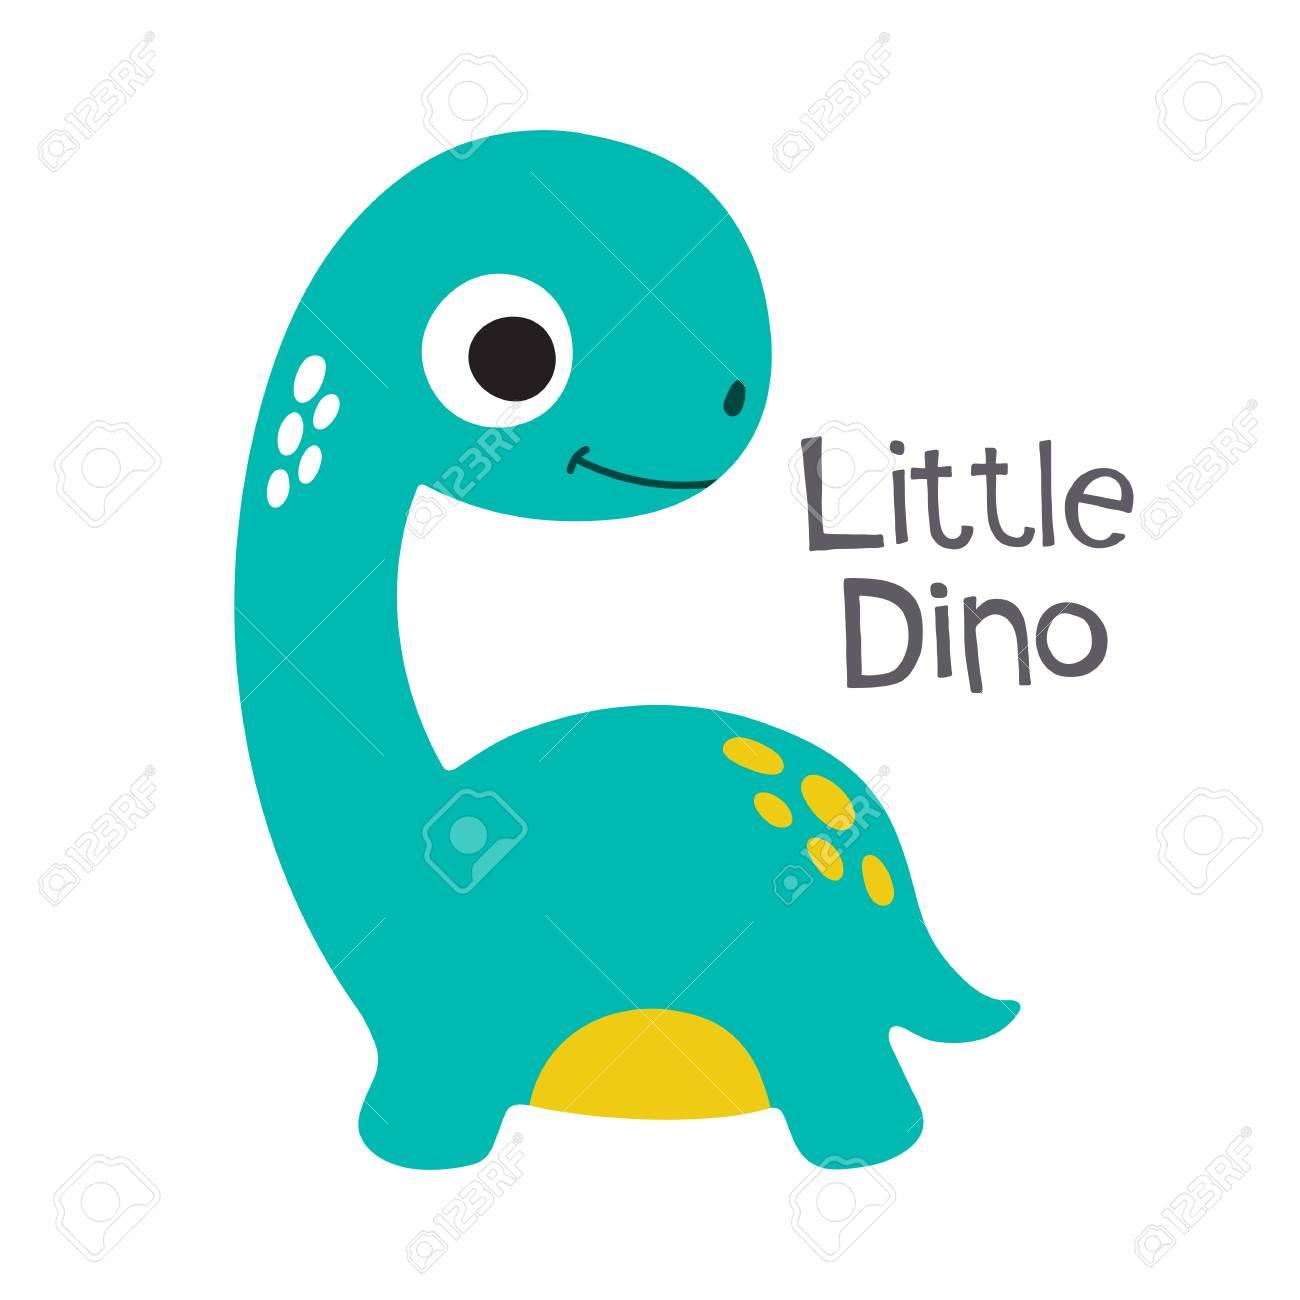 Image of: Rex Cute Cartoon Dino Vector Illustration Little Dino Stock Vector 87562907 123rfcom Cute Cartoon Dino Vector Illustration Little Dino Royalty Free